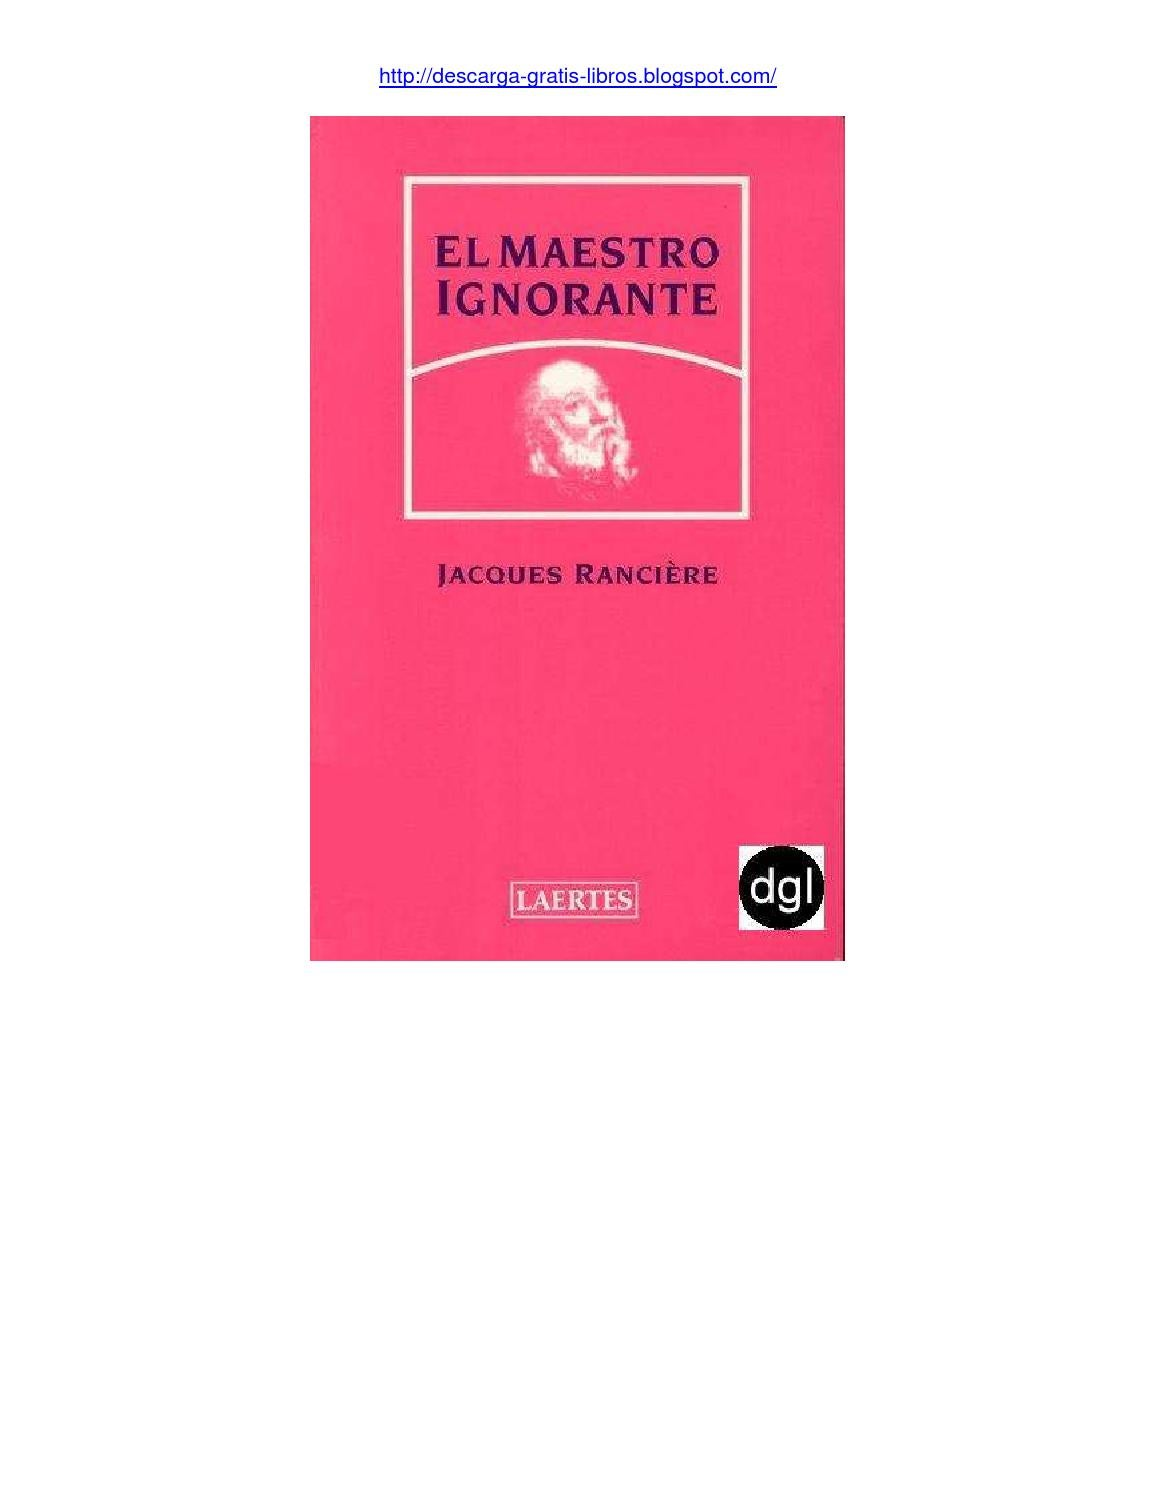 Ranciere maestro ignorante by Jorge Quispe - issuu